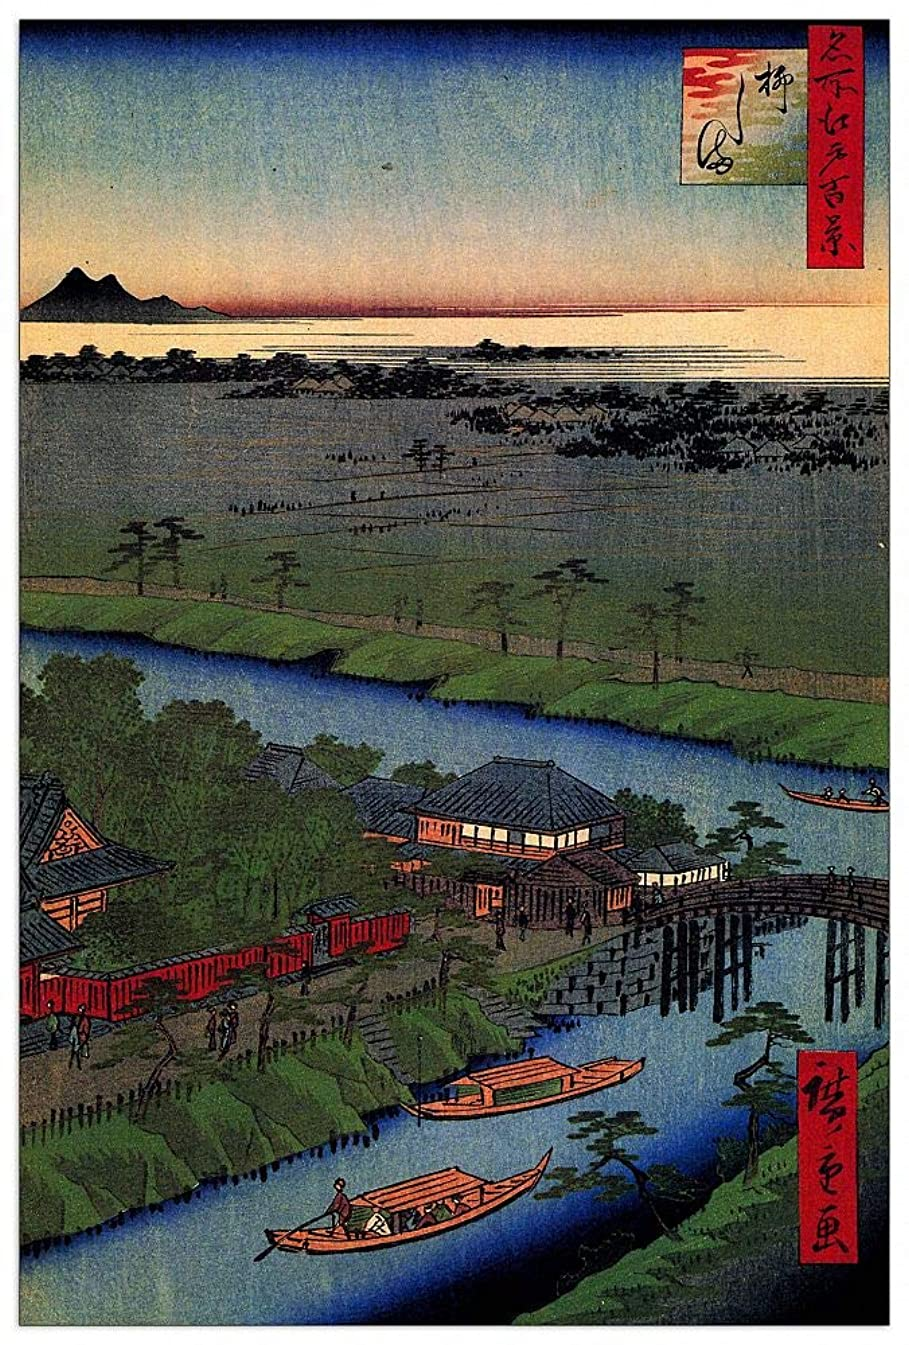 ArtPlaza TW92980 Hiroshige Utagawa - Yanagishima Decorative Panel 27.5x39.5 Inch Multicolored